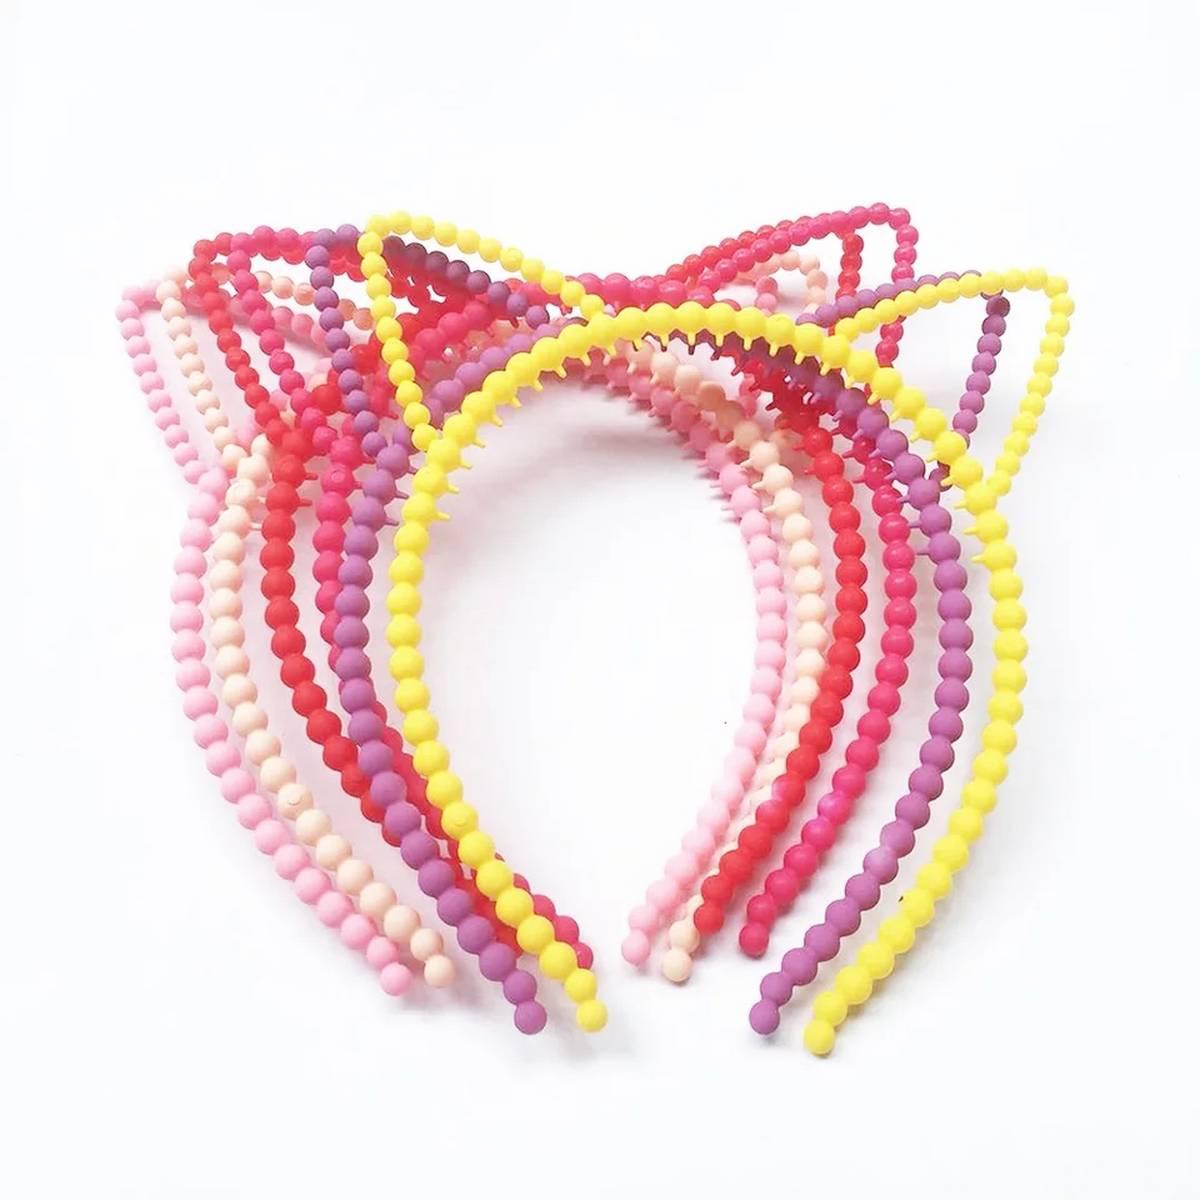 1pc Cute Cartoon Cat Ears Girls Pearl Headbands Princess Crown Party Hairbands Tiara Plastic Turban Kids Headwear